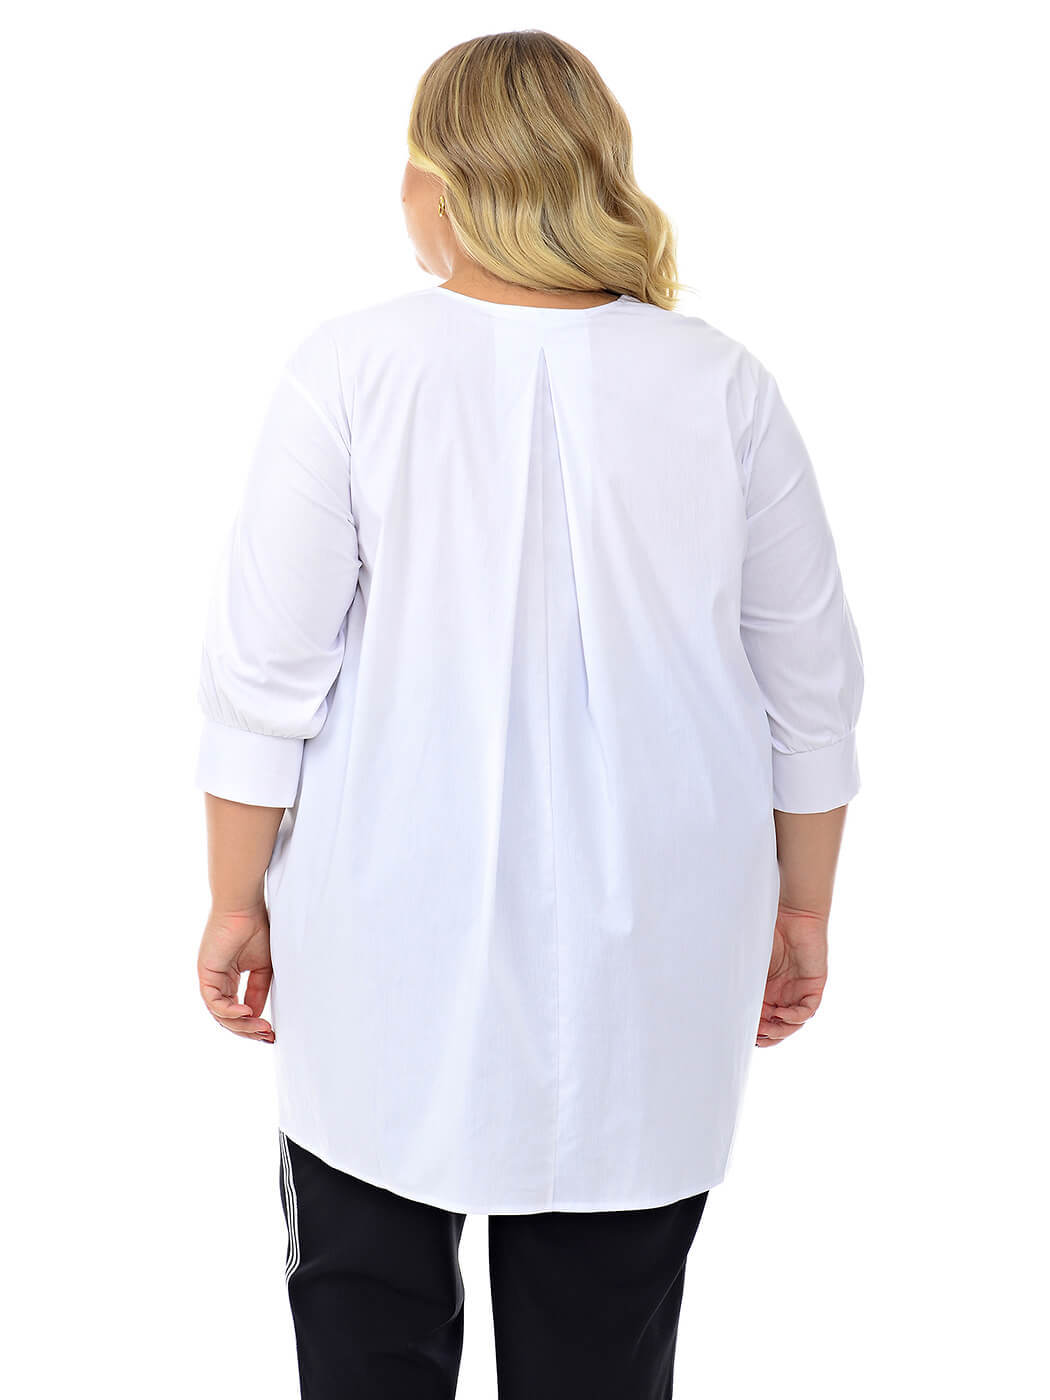 Белая асимметричная туника-рубашка